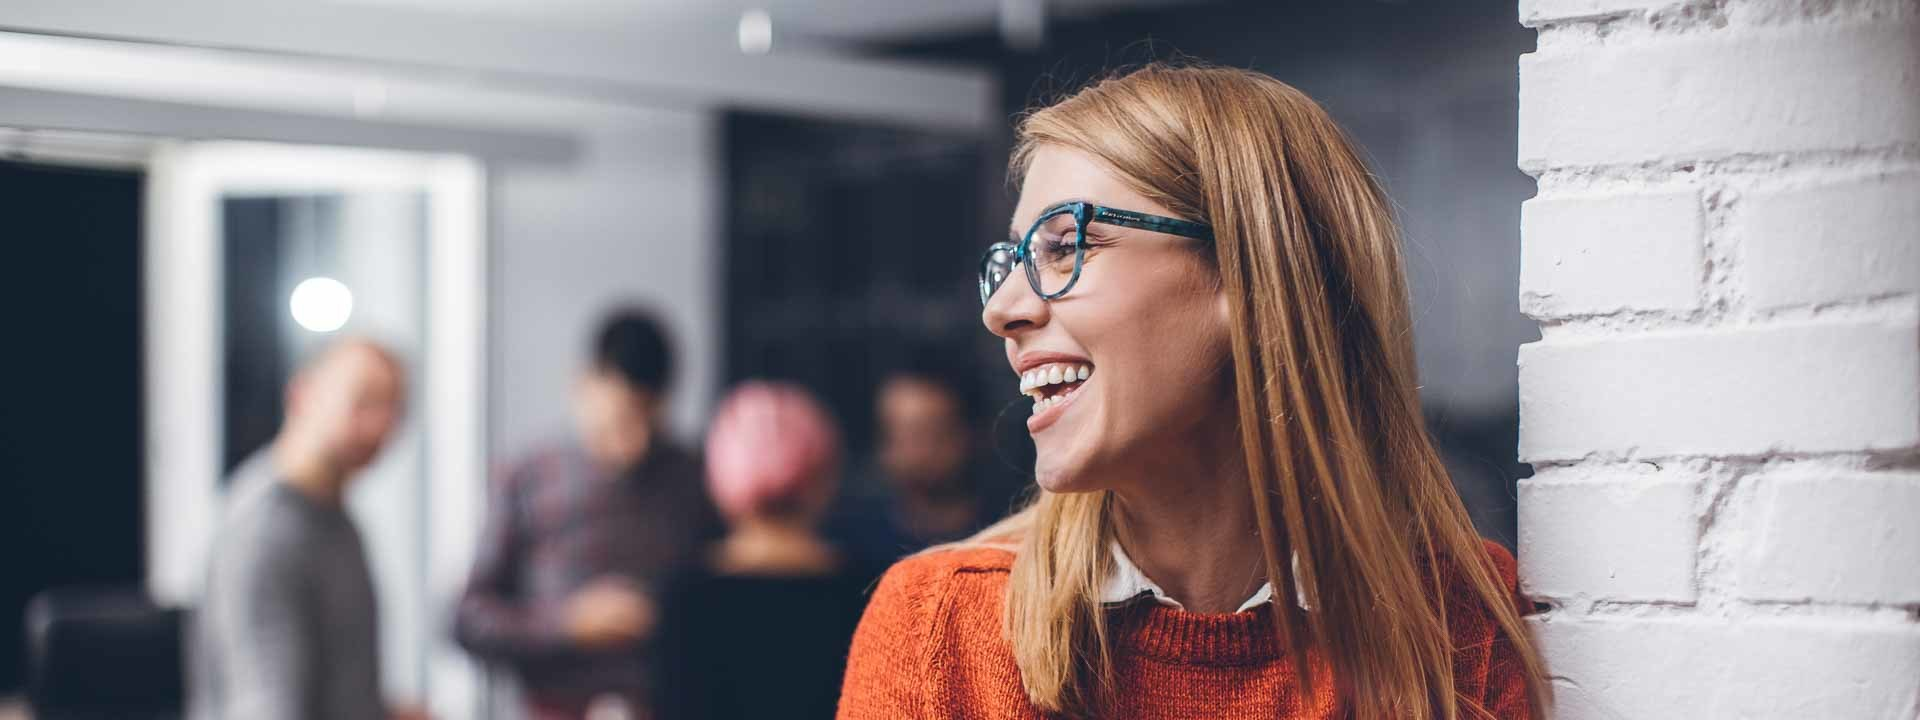 Wetzel Jobs Treuhand Immobilien Frau lachend seitlich